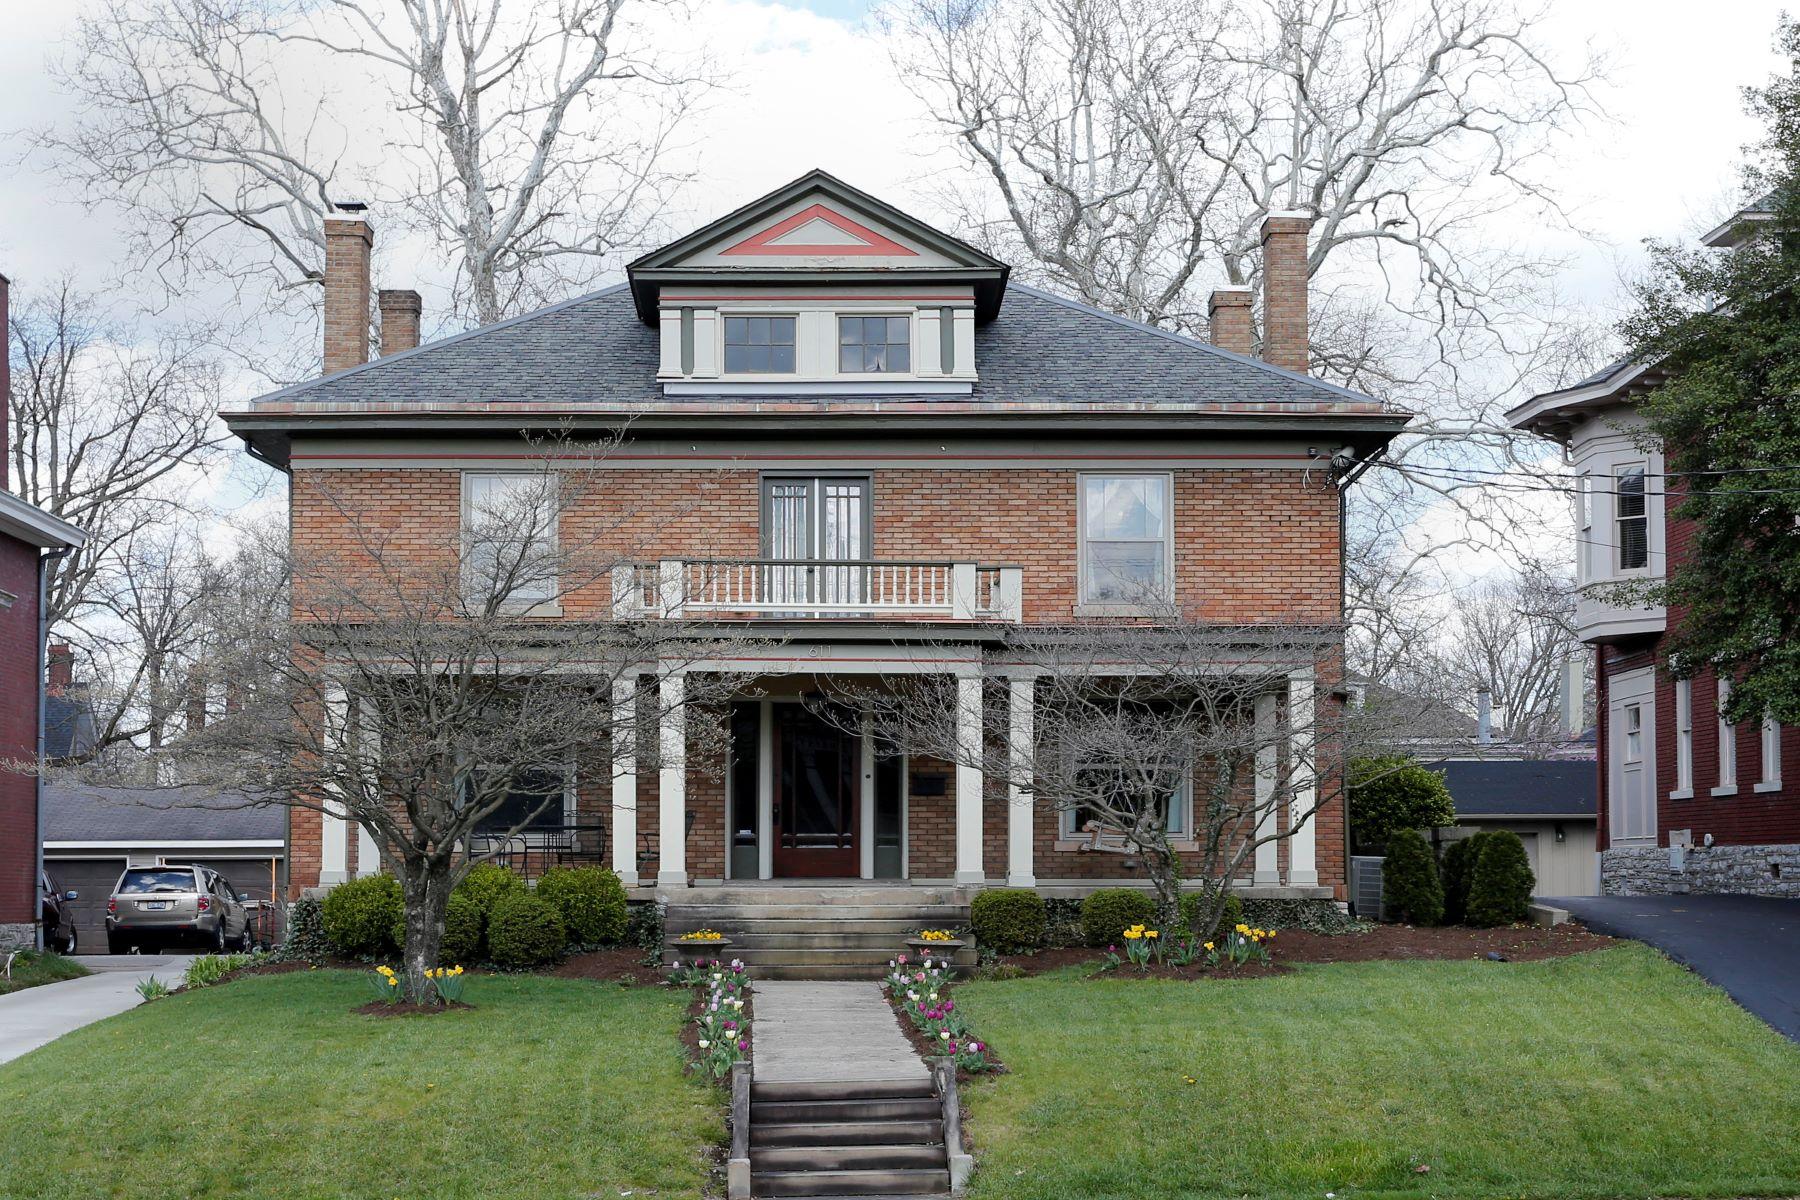 Single Family Home for Sale at 611 E. Main Street Lexington, Kentucky 40508 United States